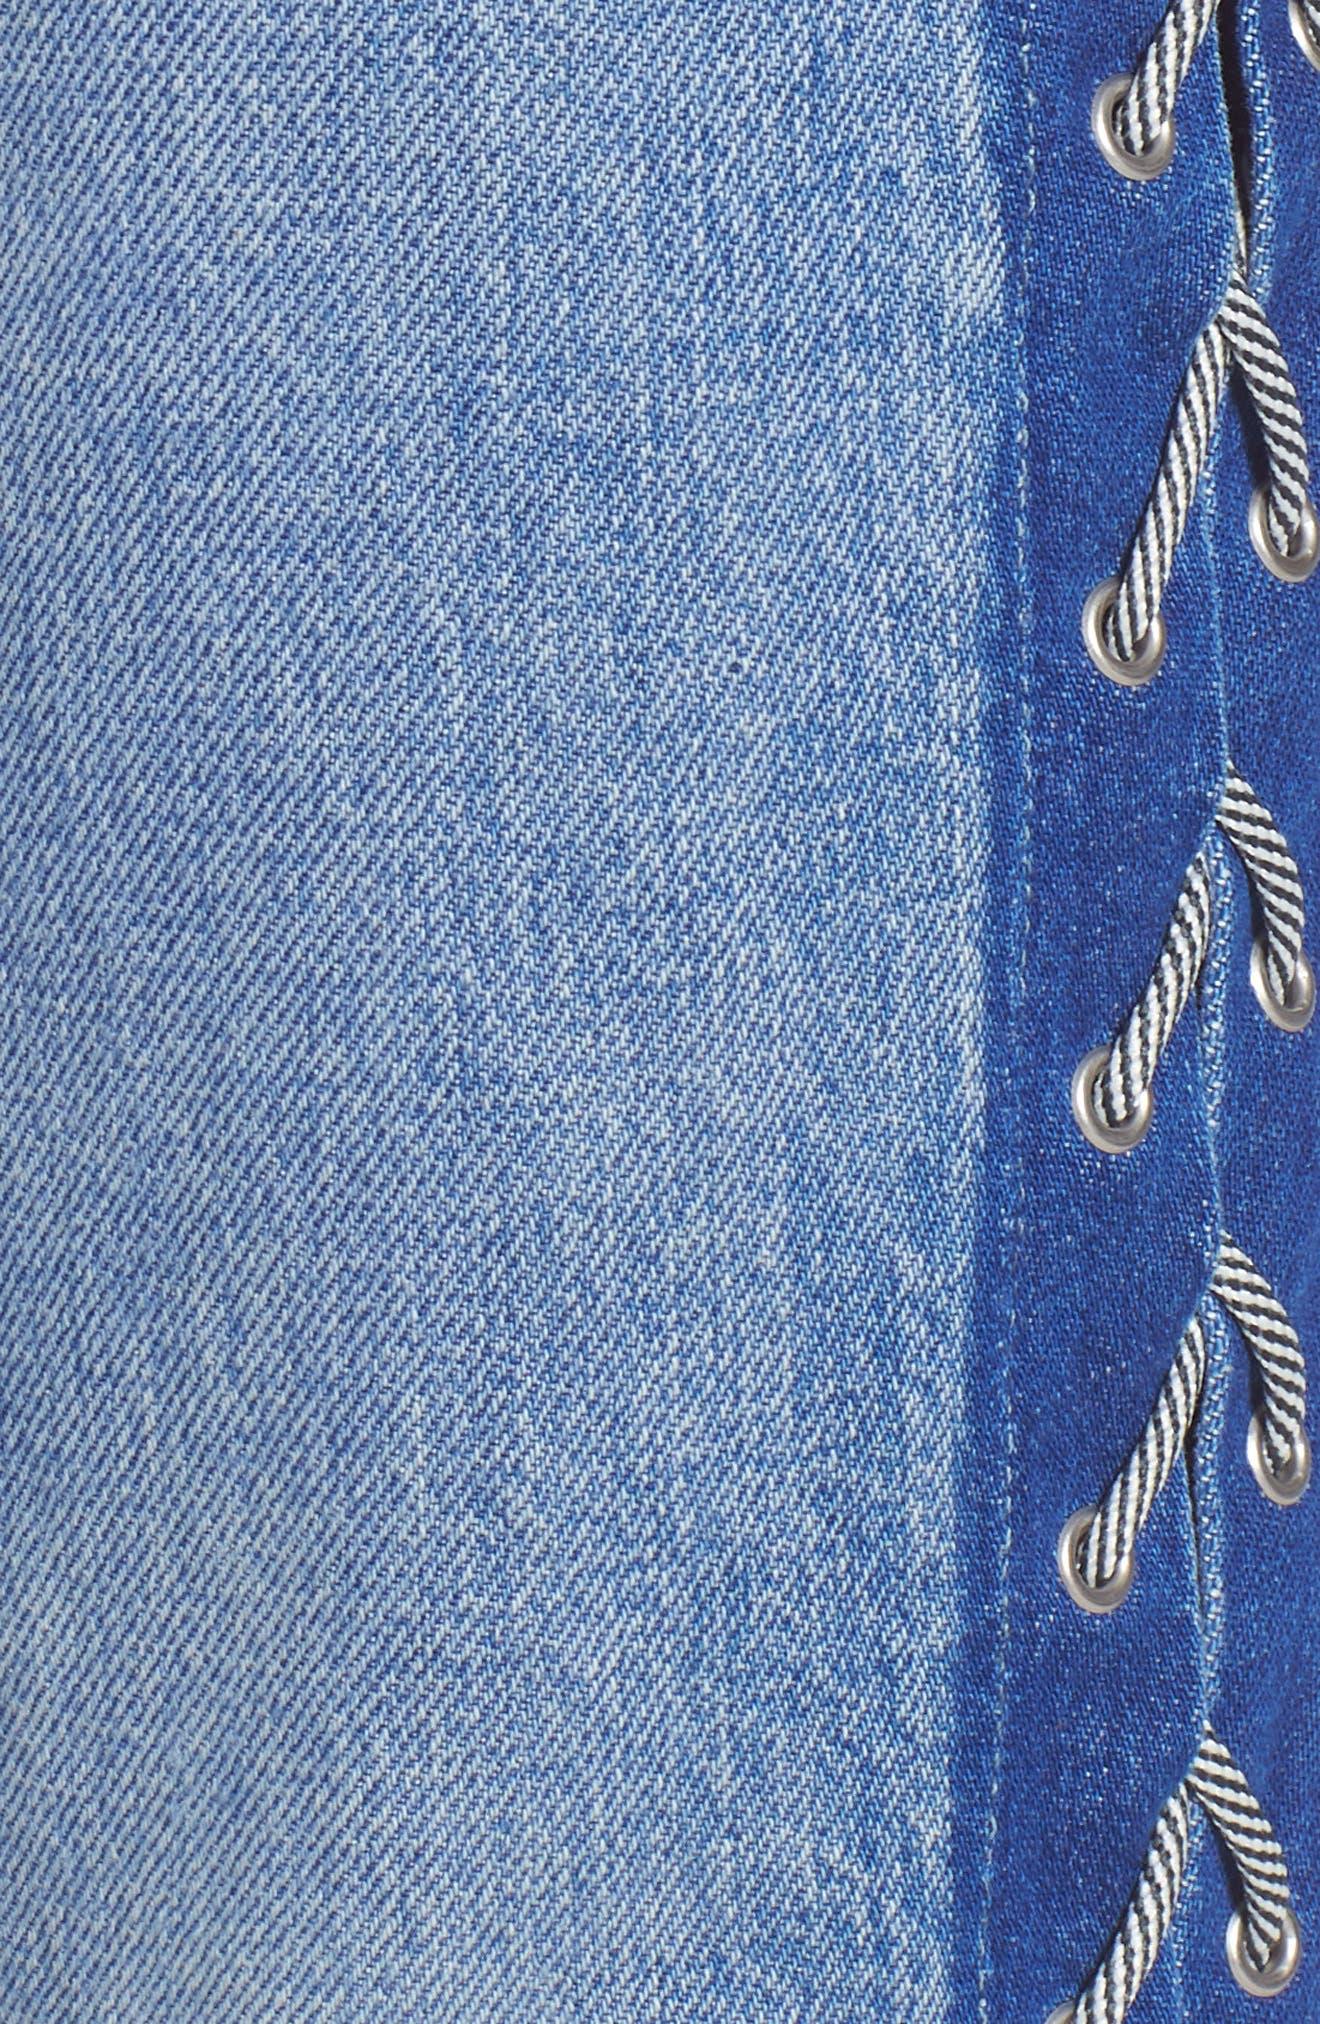 Zoeey High Waist Crop Straight Leg Jeans,                             Alternate thumbnail 6, color,                             460